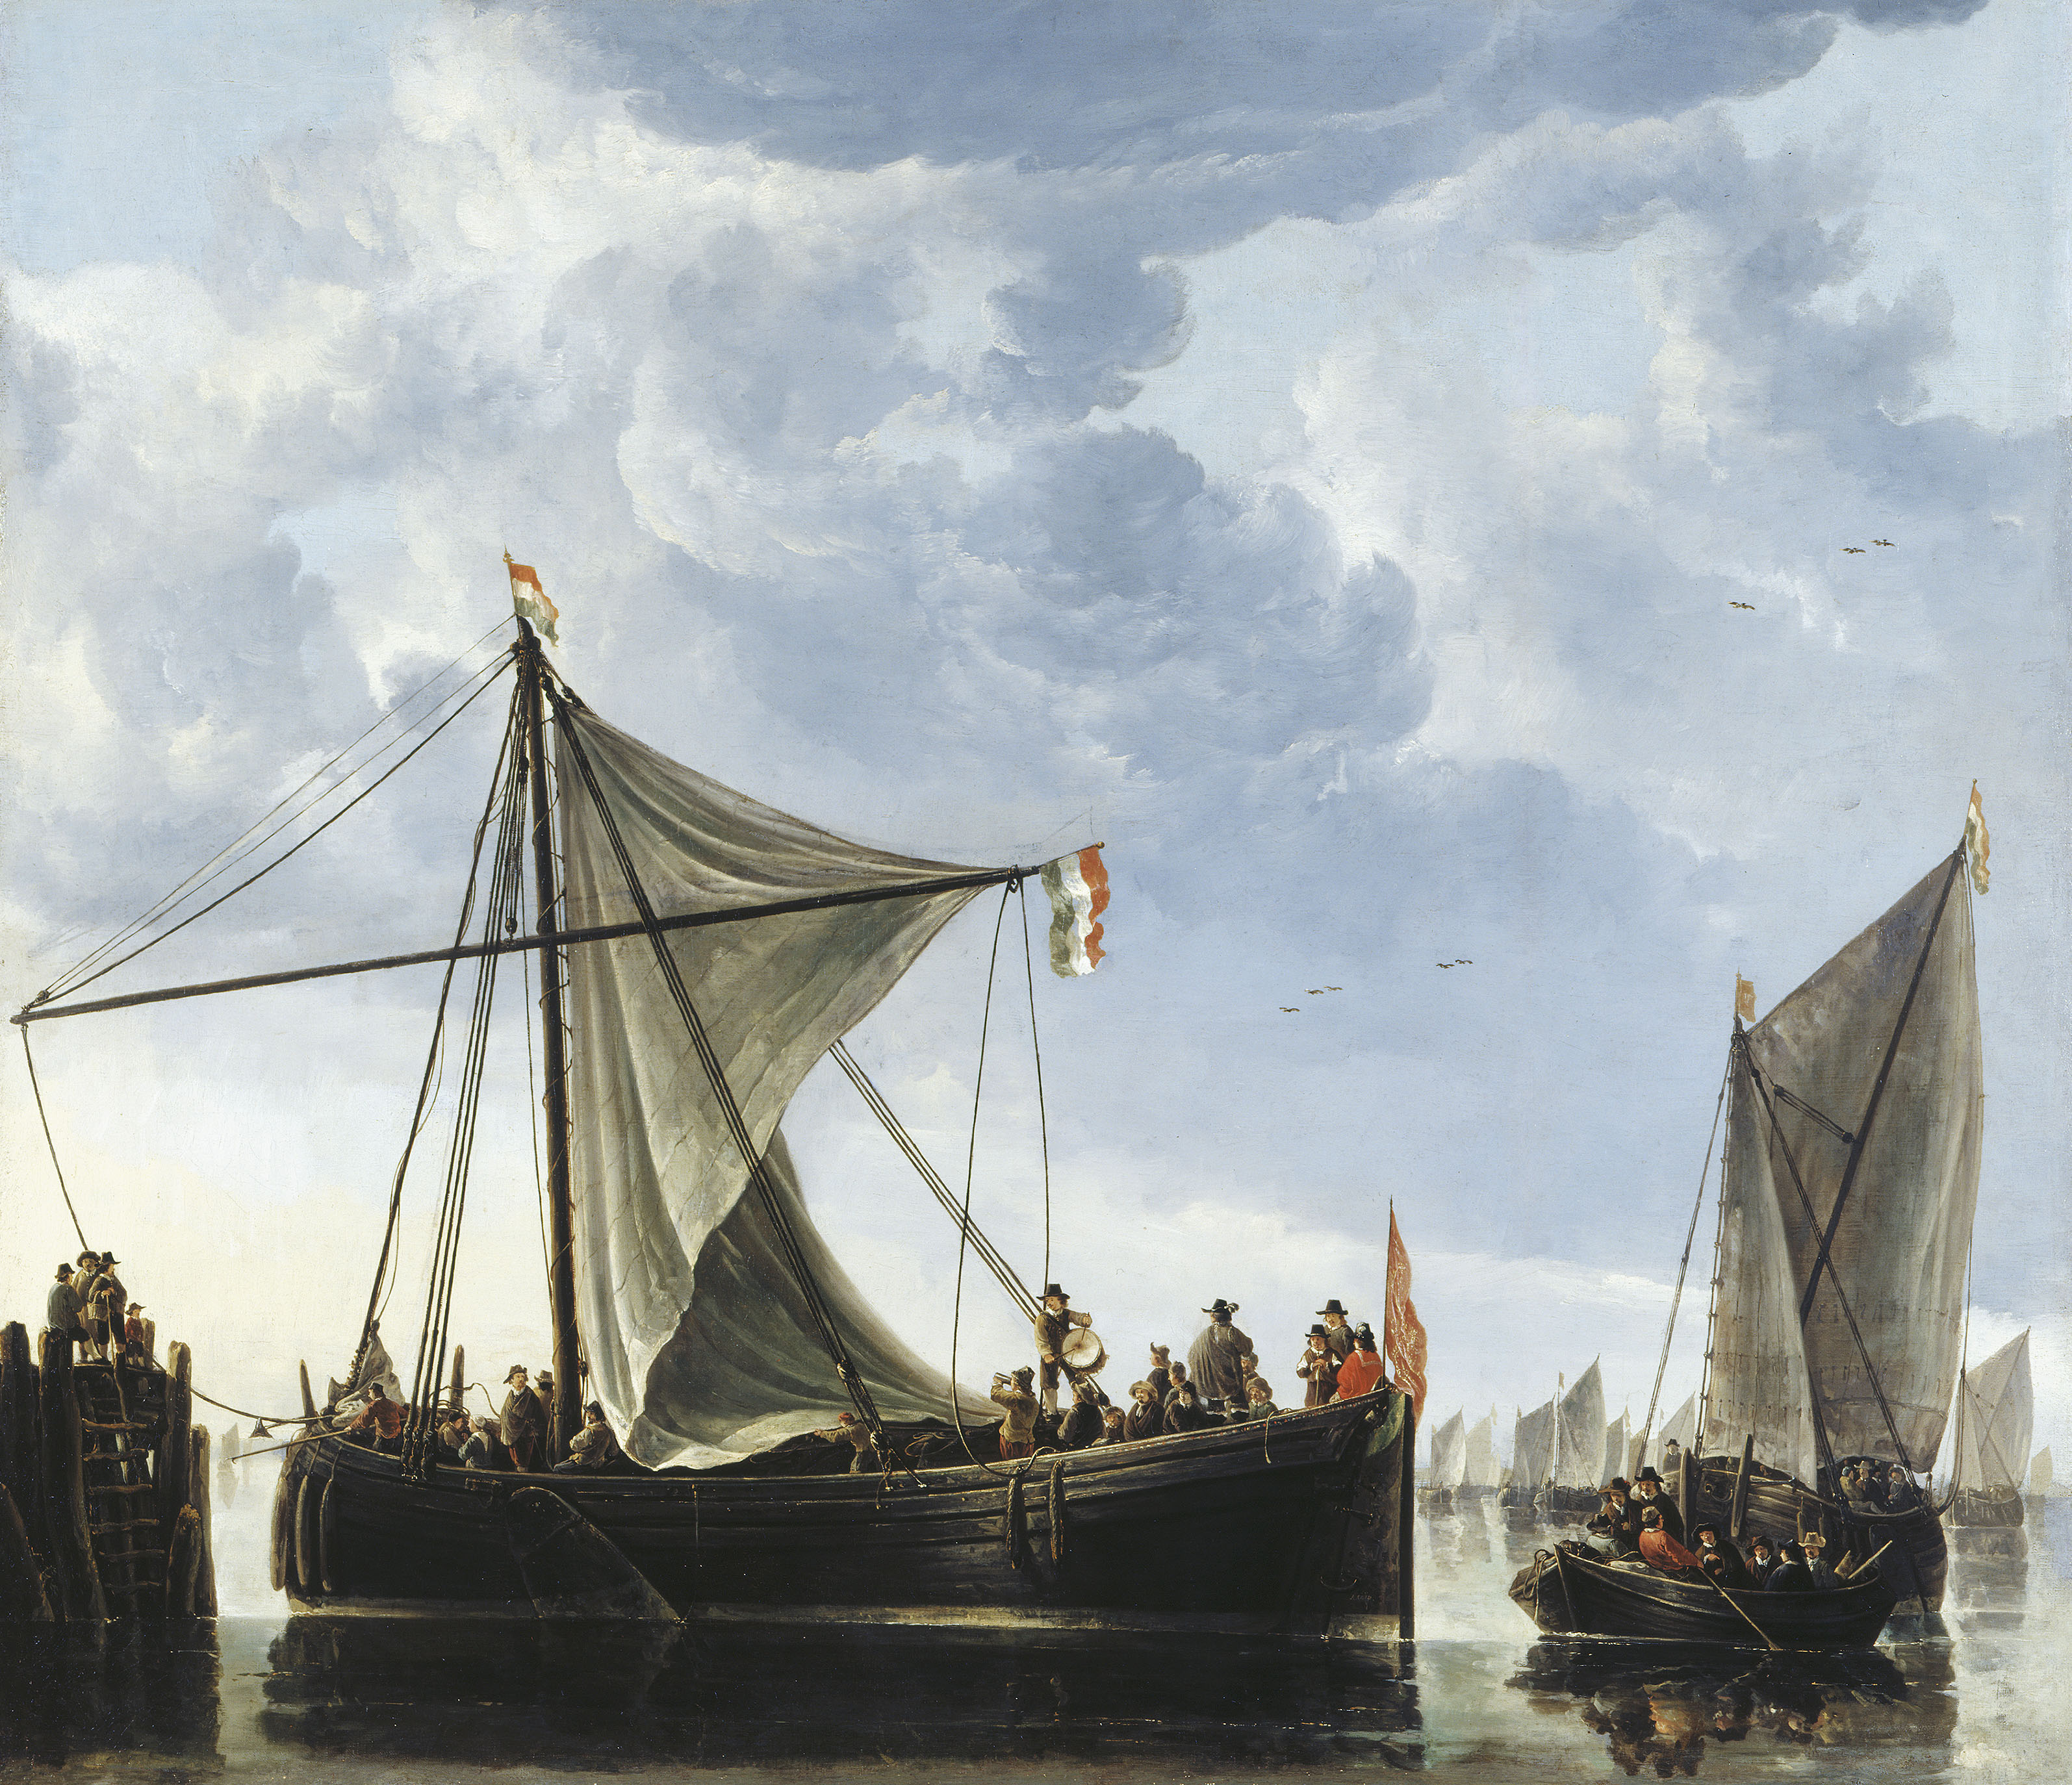 Aelbert Cuyp, The Passage Boat, c.1650